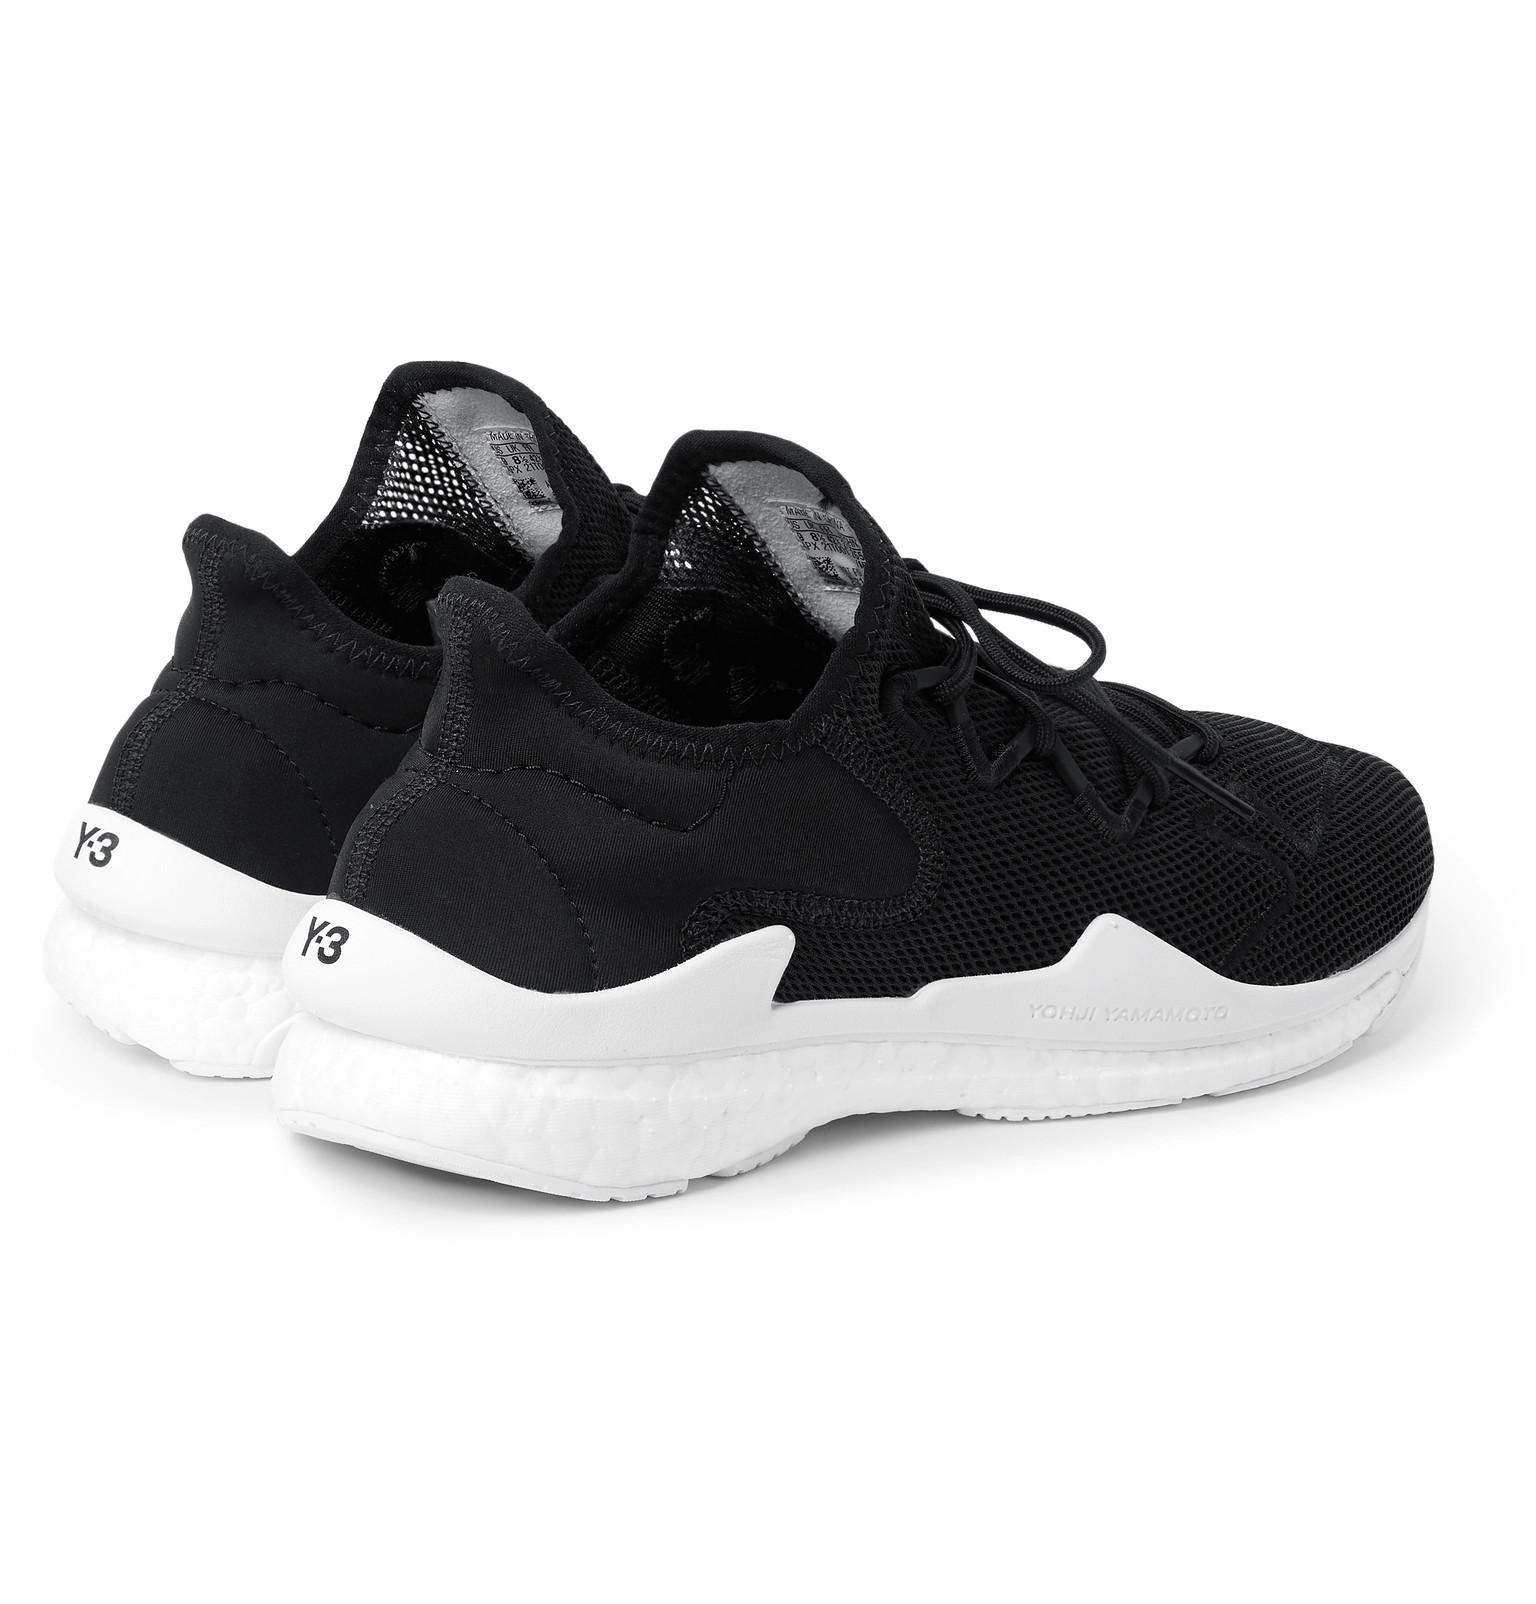 e1ea730a4 Y-3 - Adizero Runner Neoprene-Trimmed Mesh Sneakers